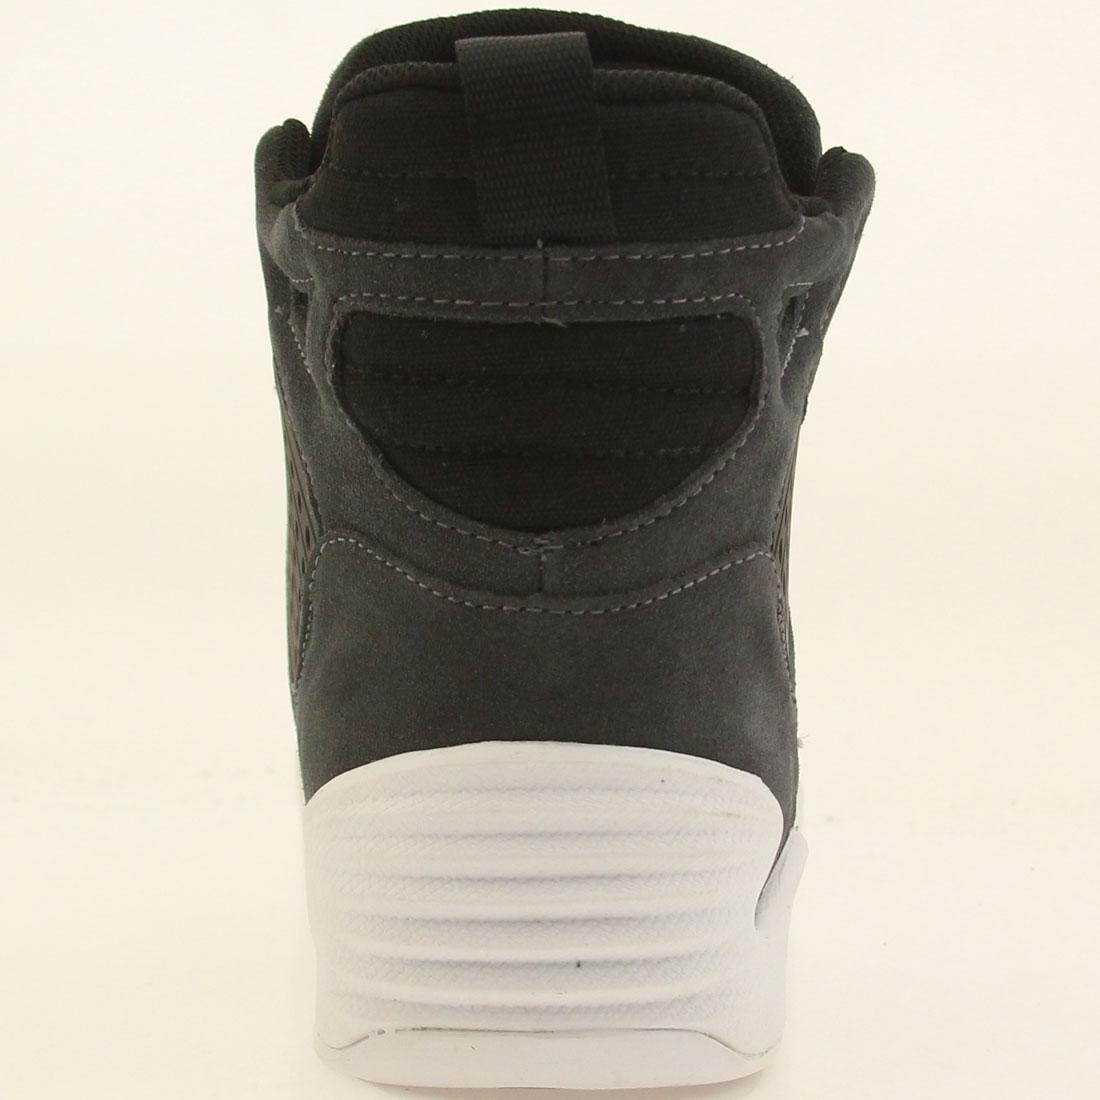 b68efe292fd3 Amazon.com  Supra Skateboard Shoes Skytop IV Magnet Black-White Sz 10  Shoes